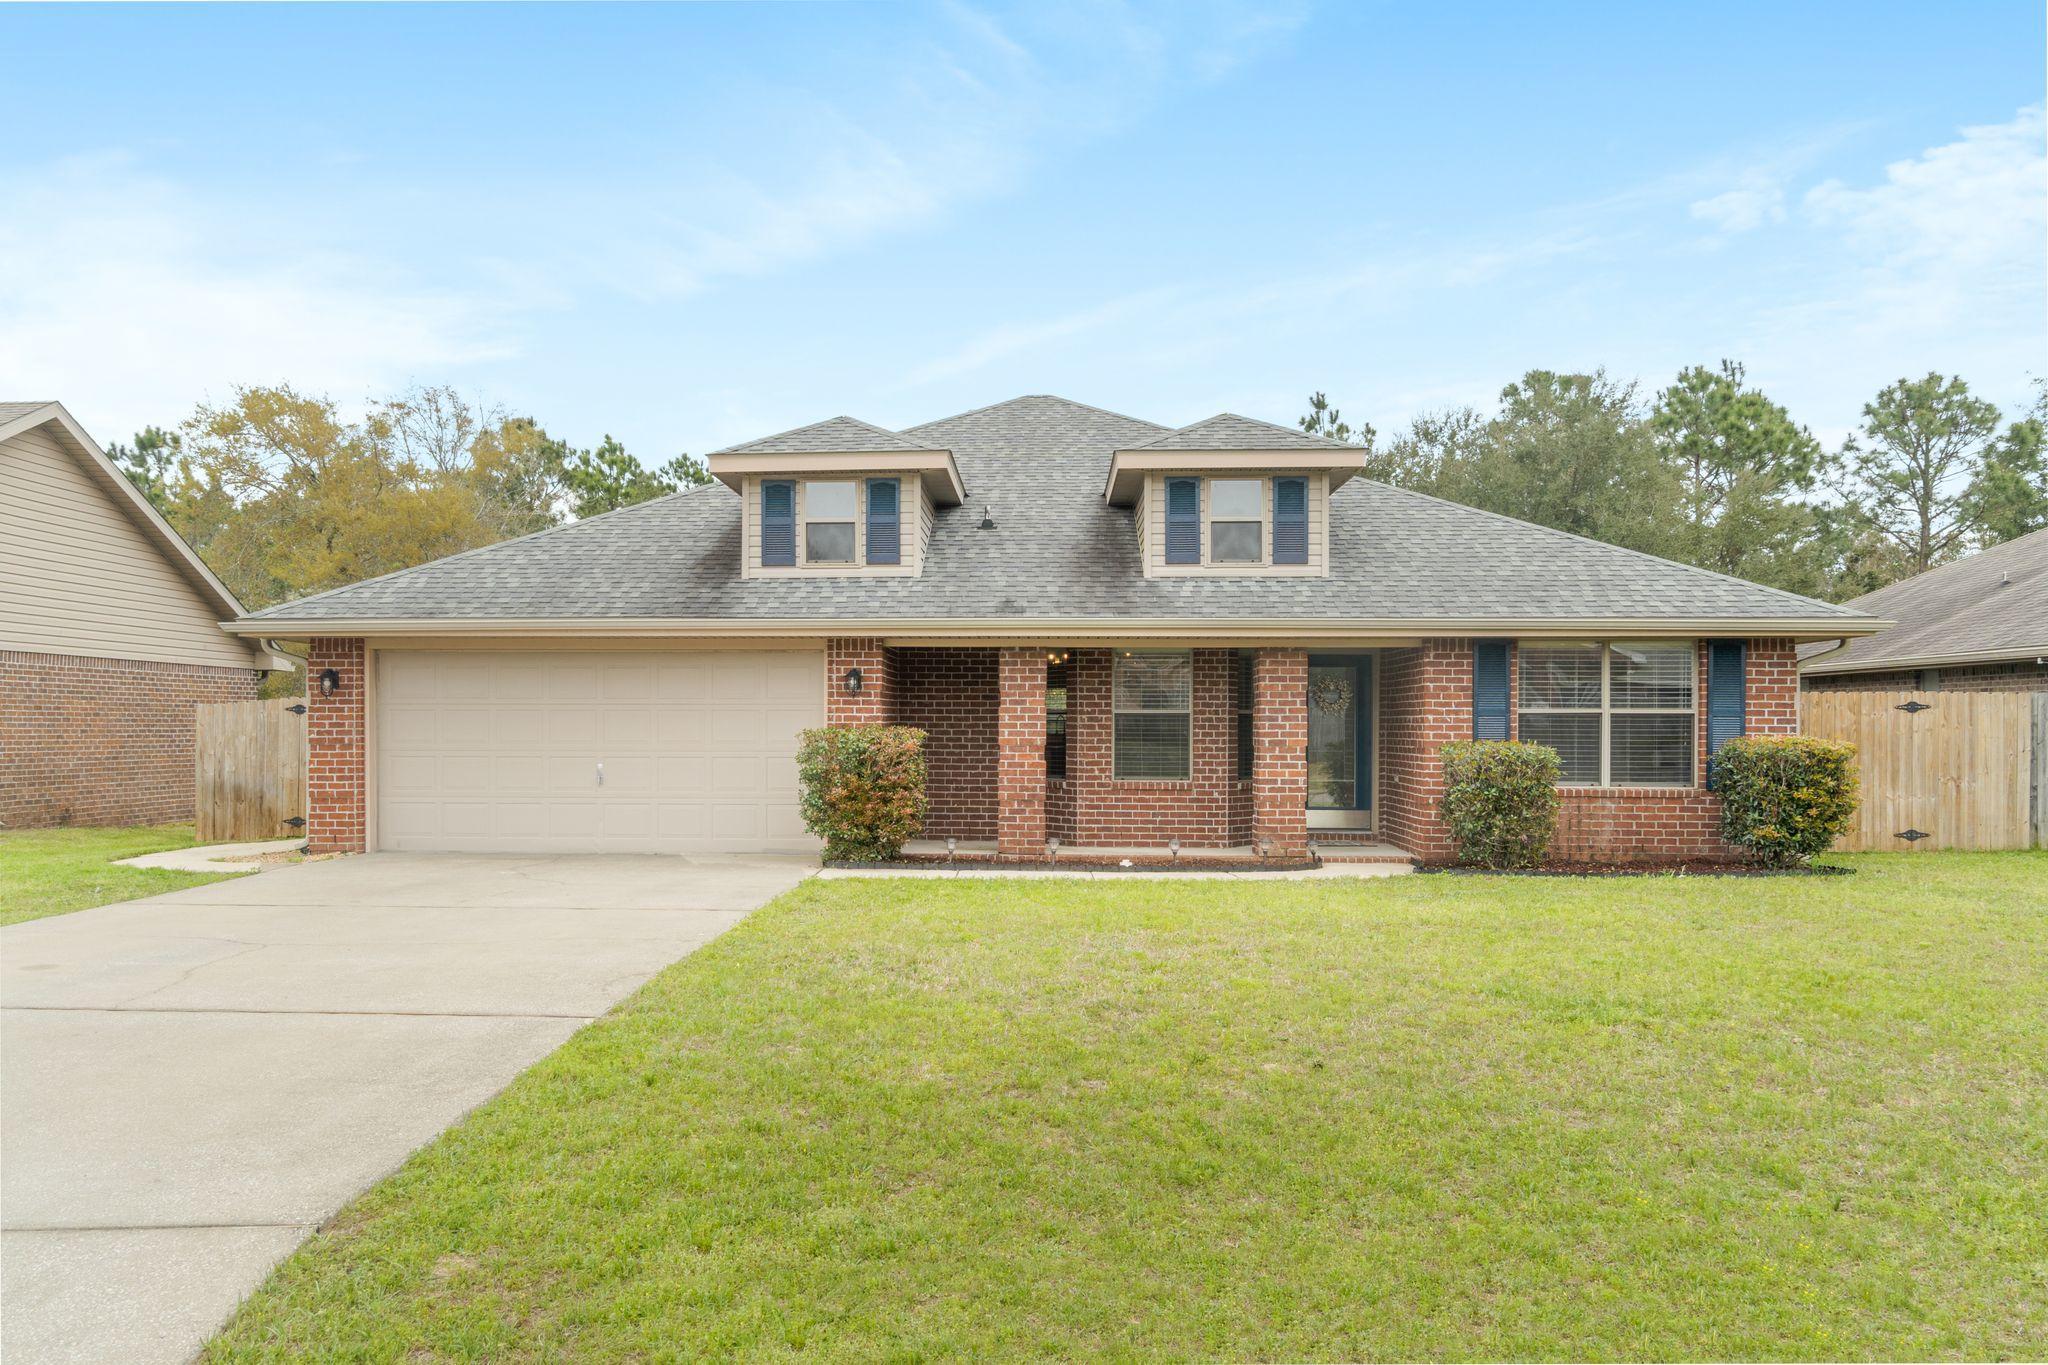 Photo of home for sale at 2784 Shoni, Navarre FL